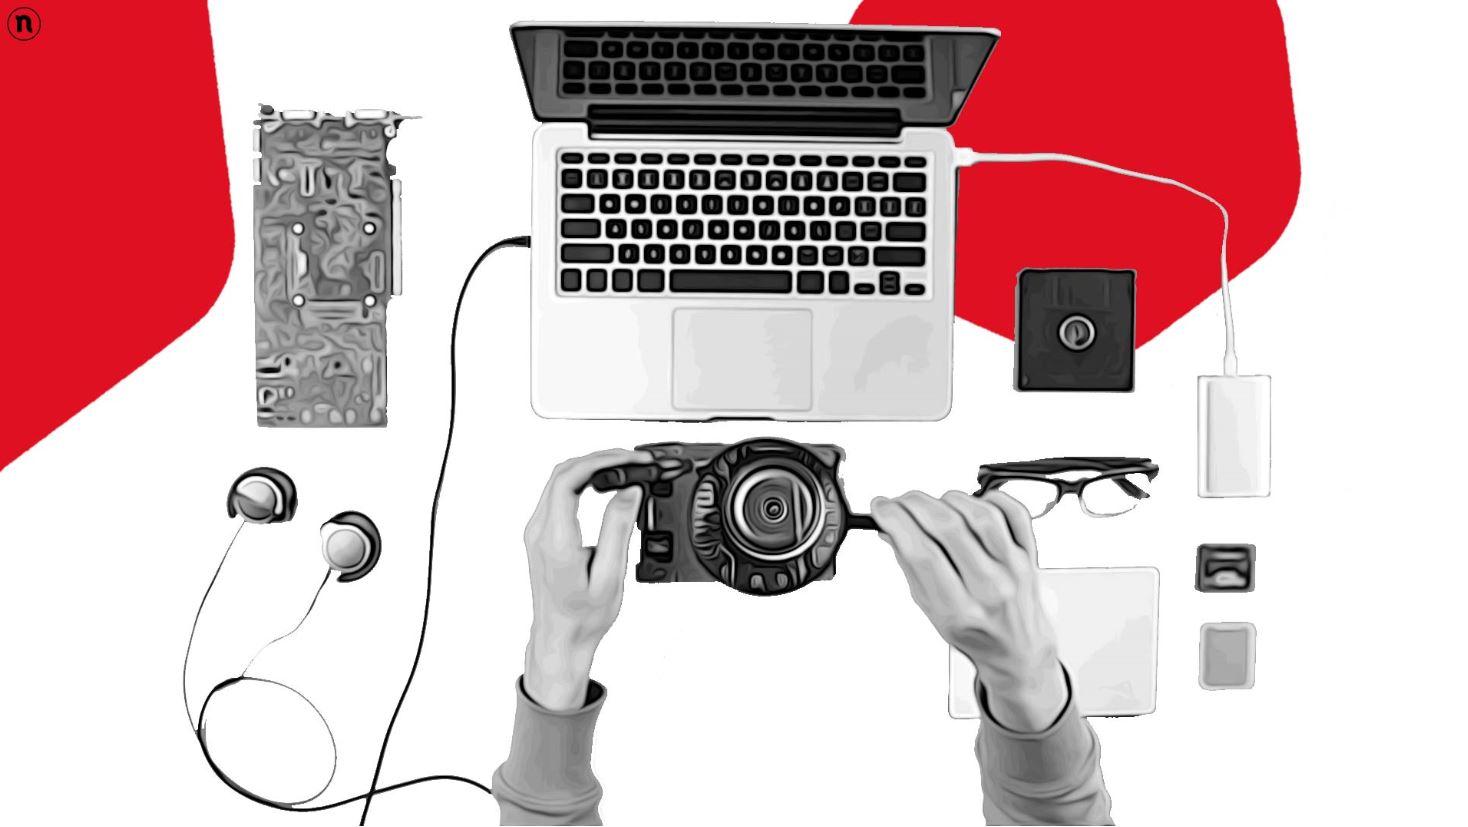 Tweetflick, Ricotta Trivia e TWM: i digital tool della settimana